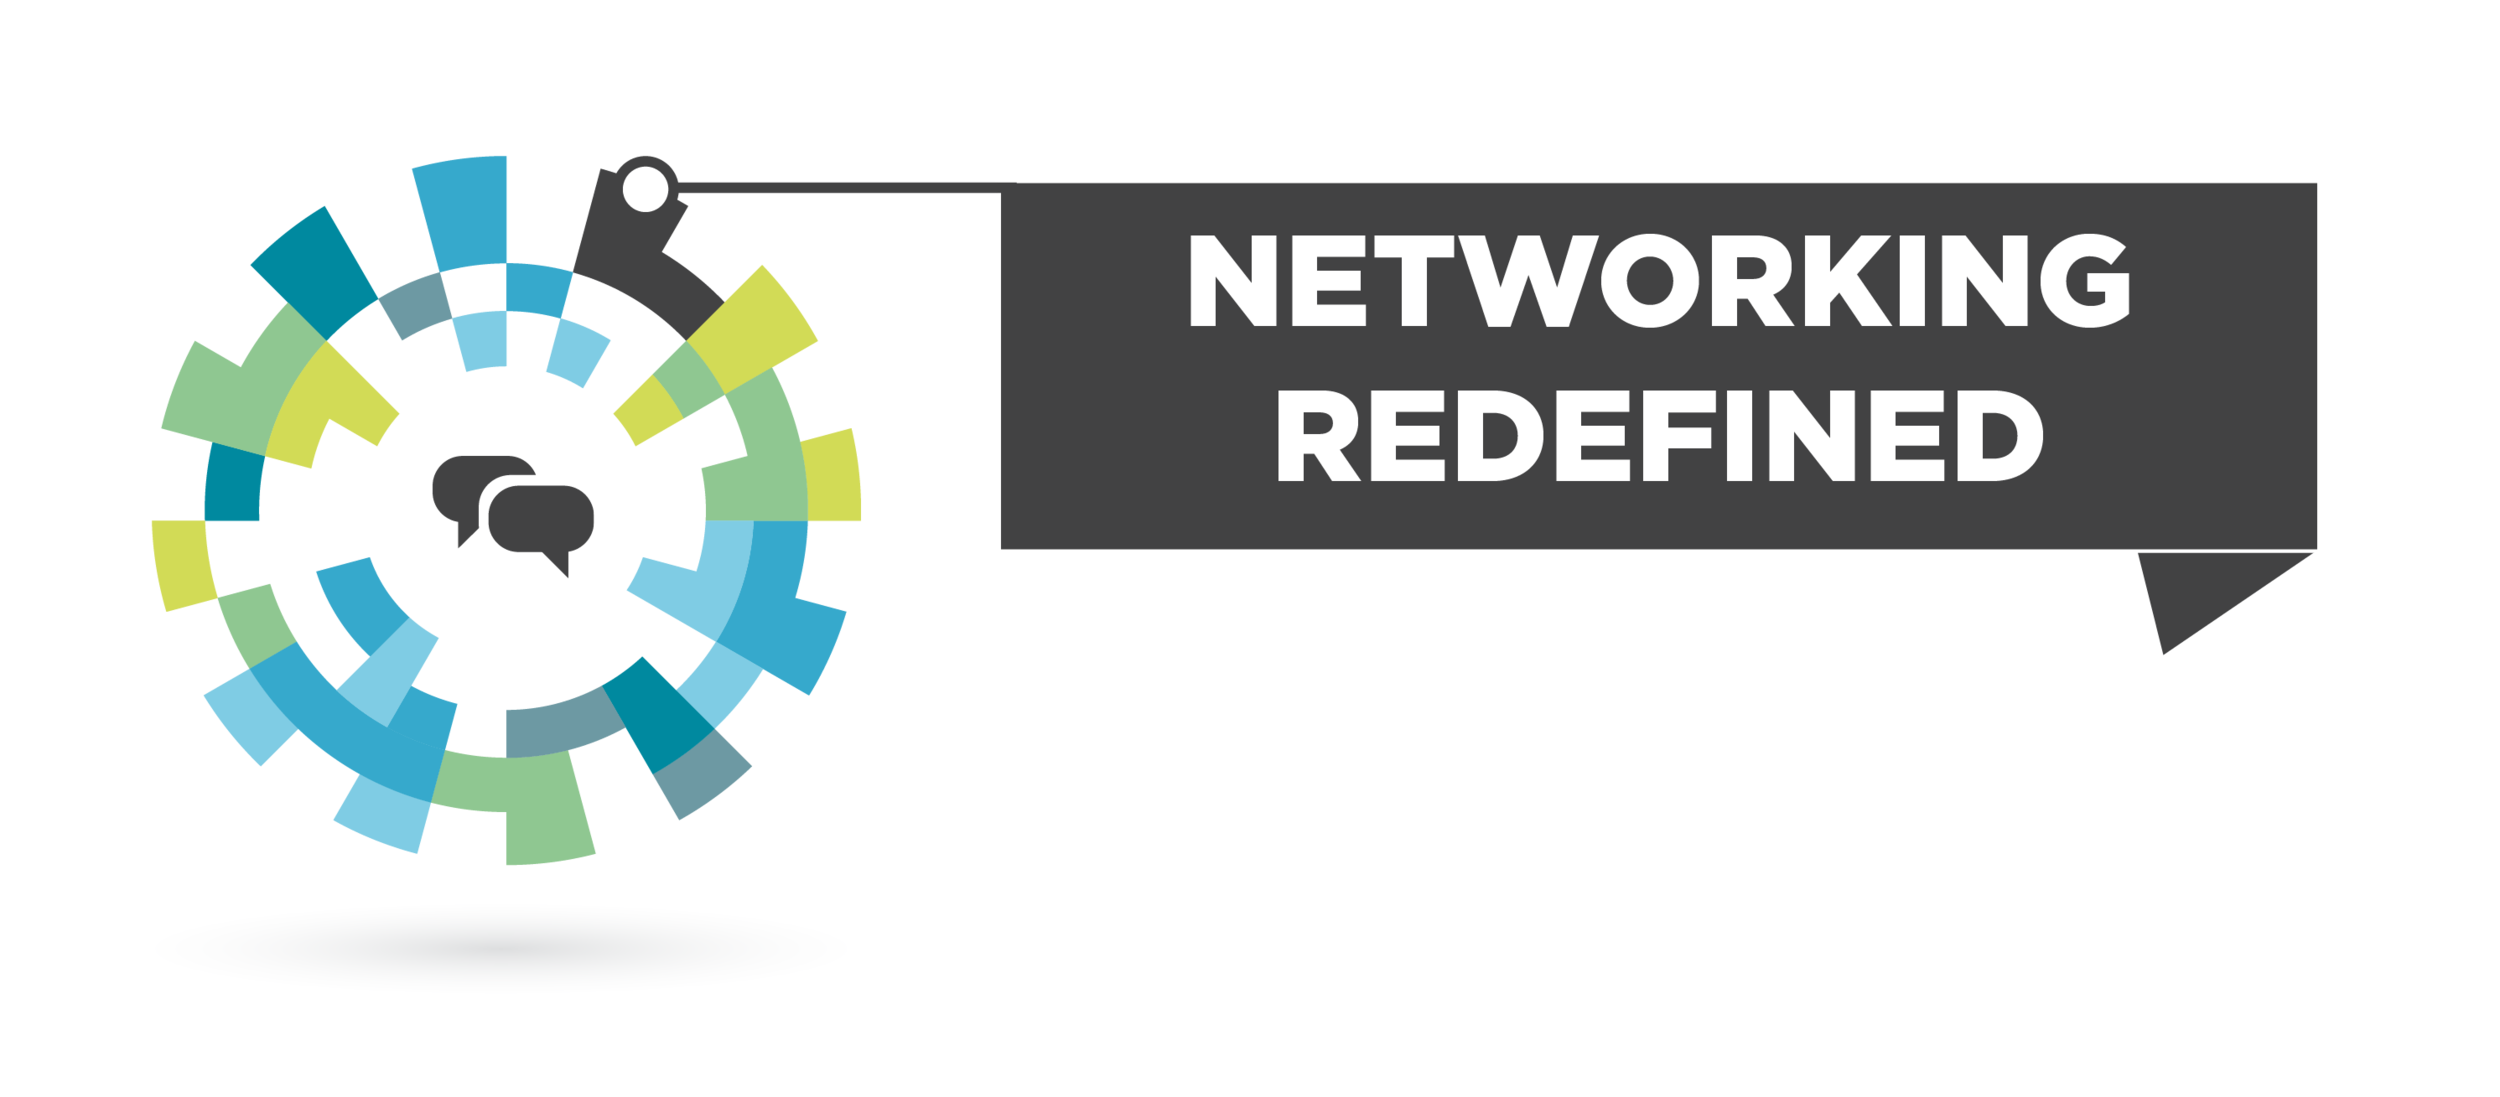 networking-redefined-nem-australasia